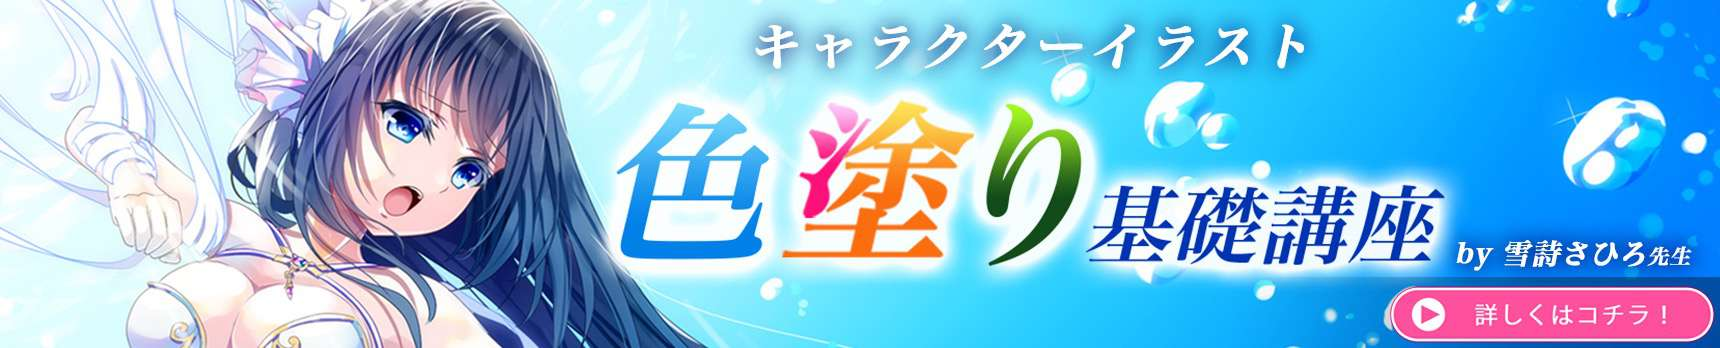 Yukiuta rec2 banner pc